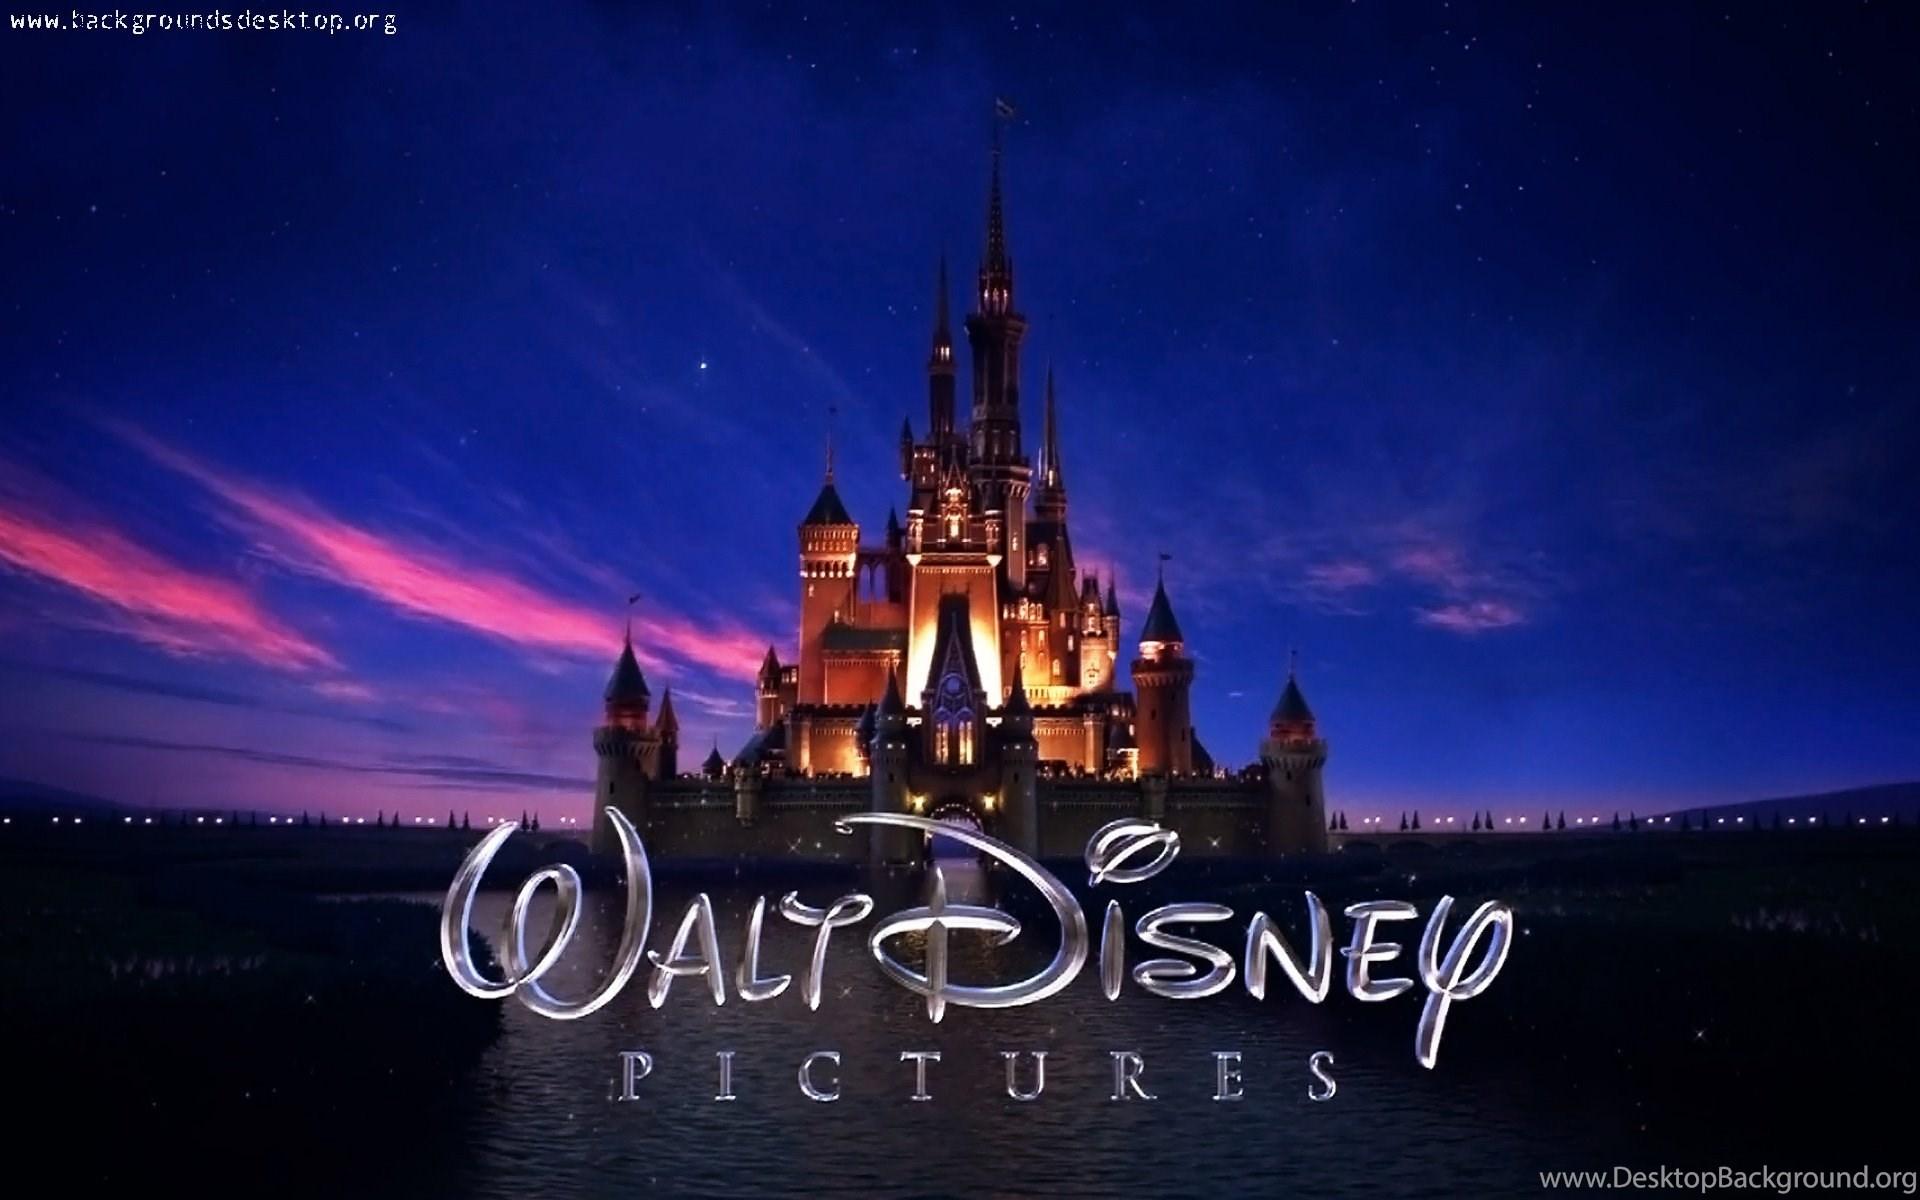 Disney Castle Wallpapers Desktop Background